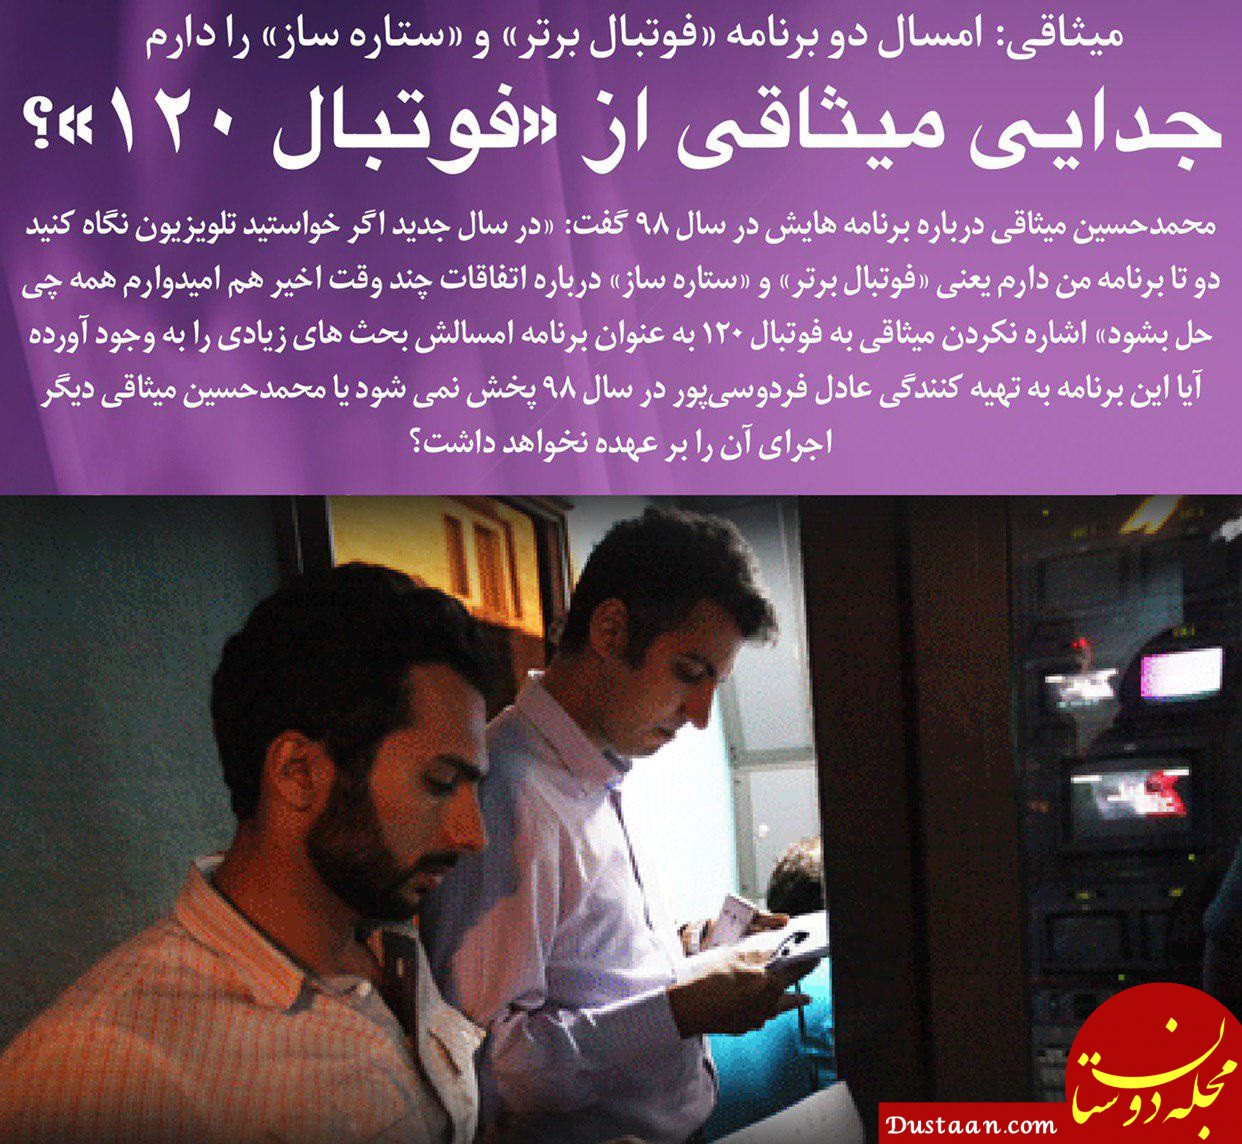 www.dustaan.com جدایی محمدحسین میثاقی از «فوتبال ۱۲۰»؟